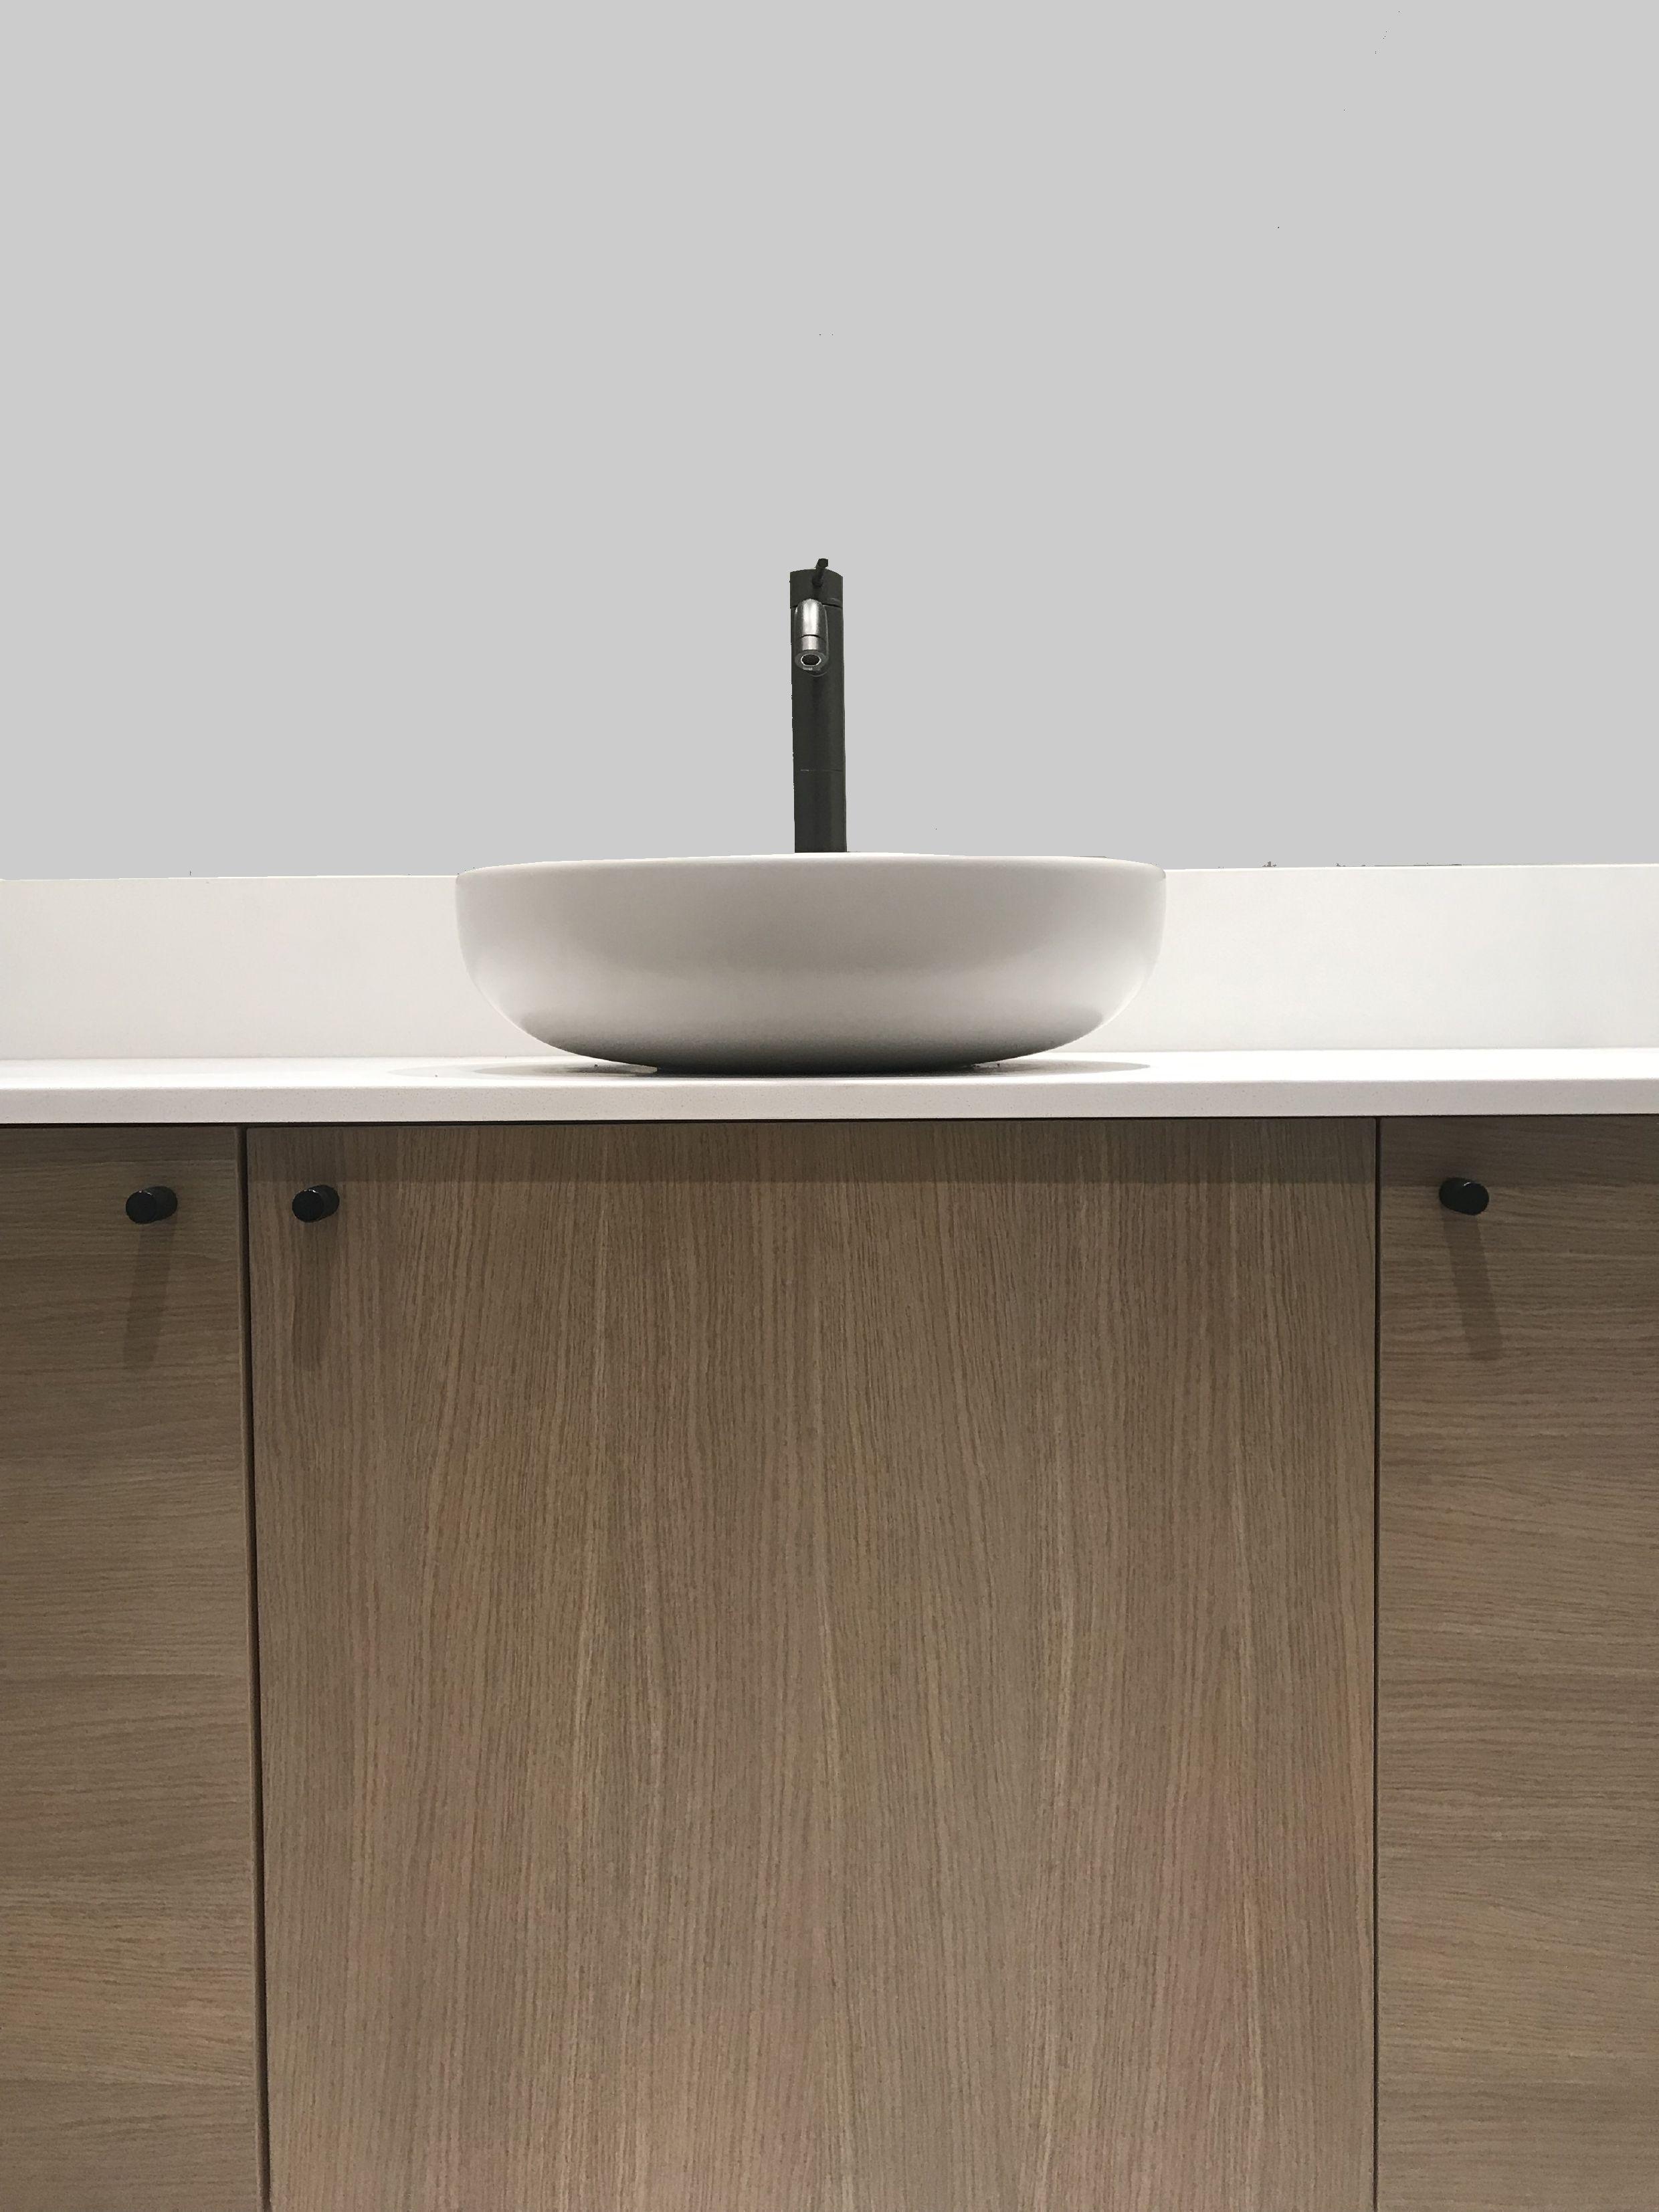 37+ Porte meuble salle de bain largeur 35 ideas